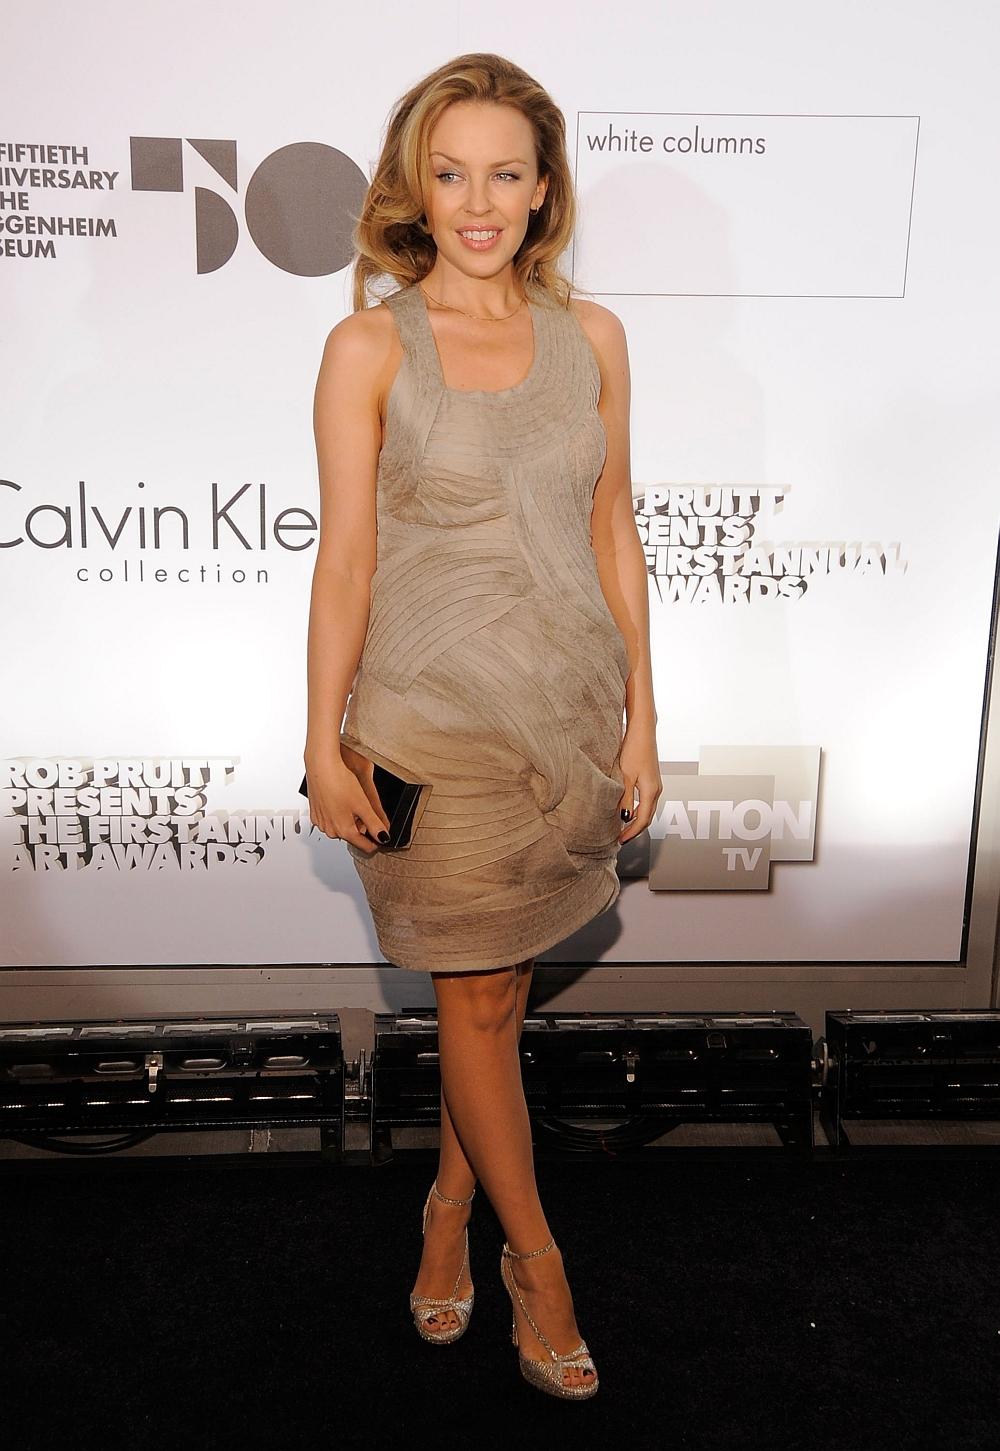 Kylie Minogue Has Sexy Legs in High Heels